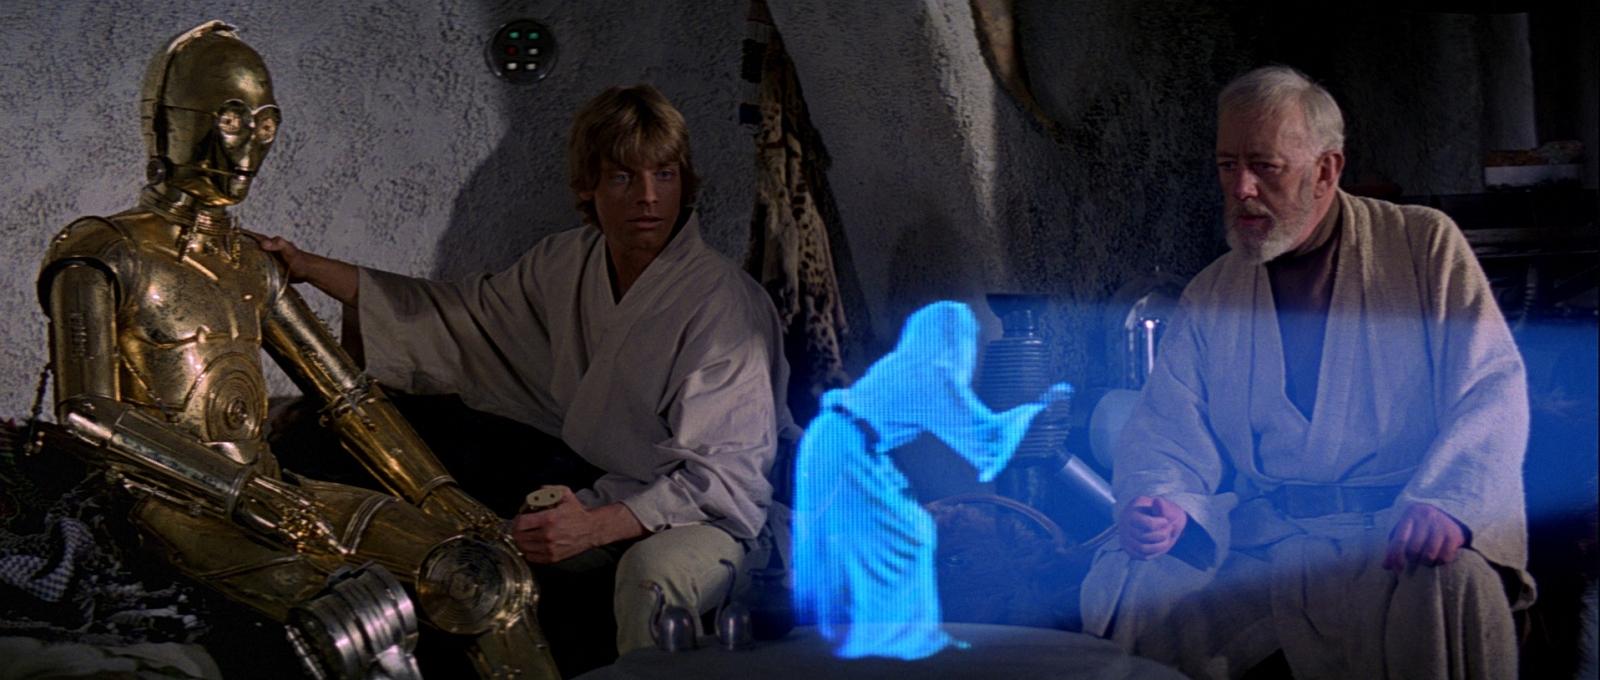 build 3d hologram